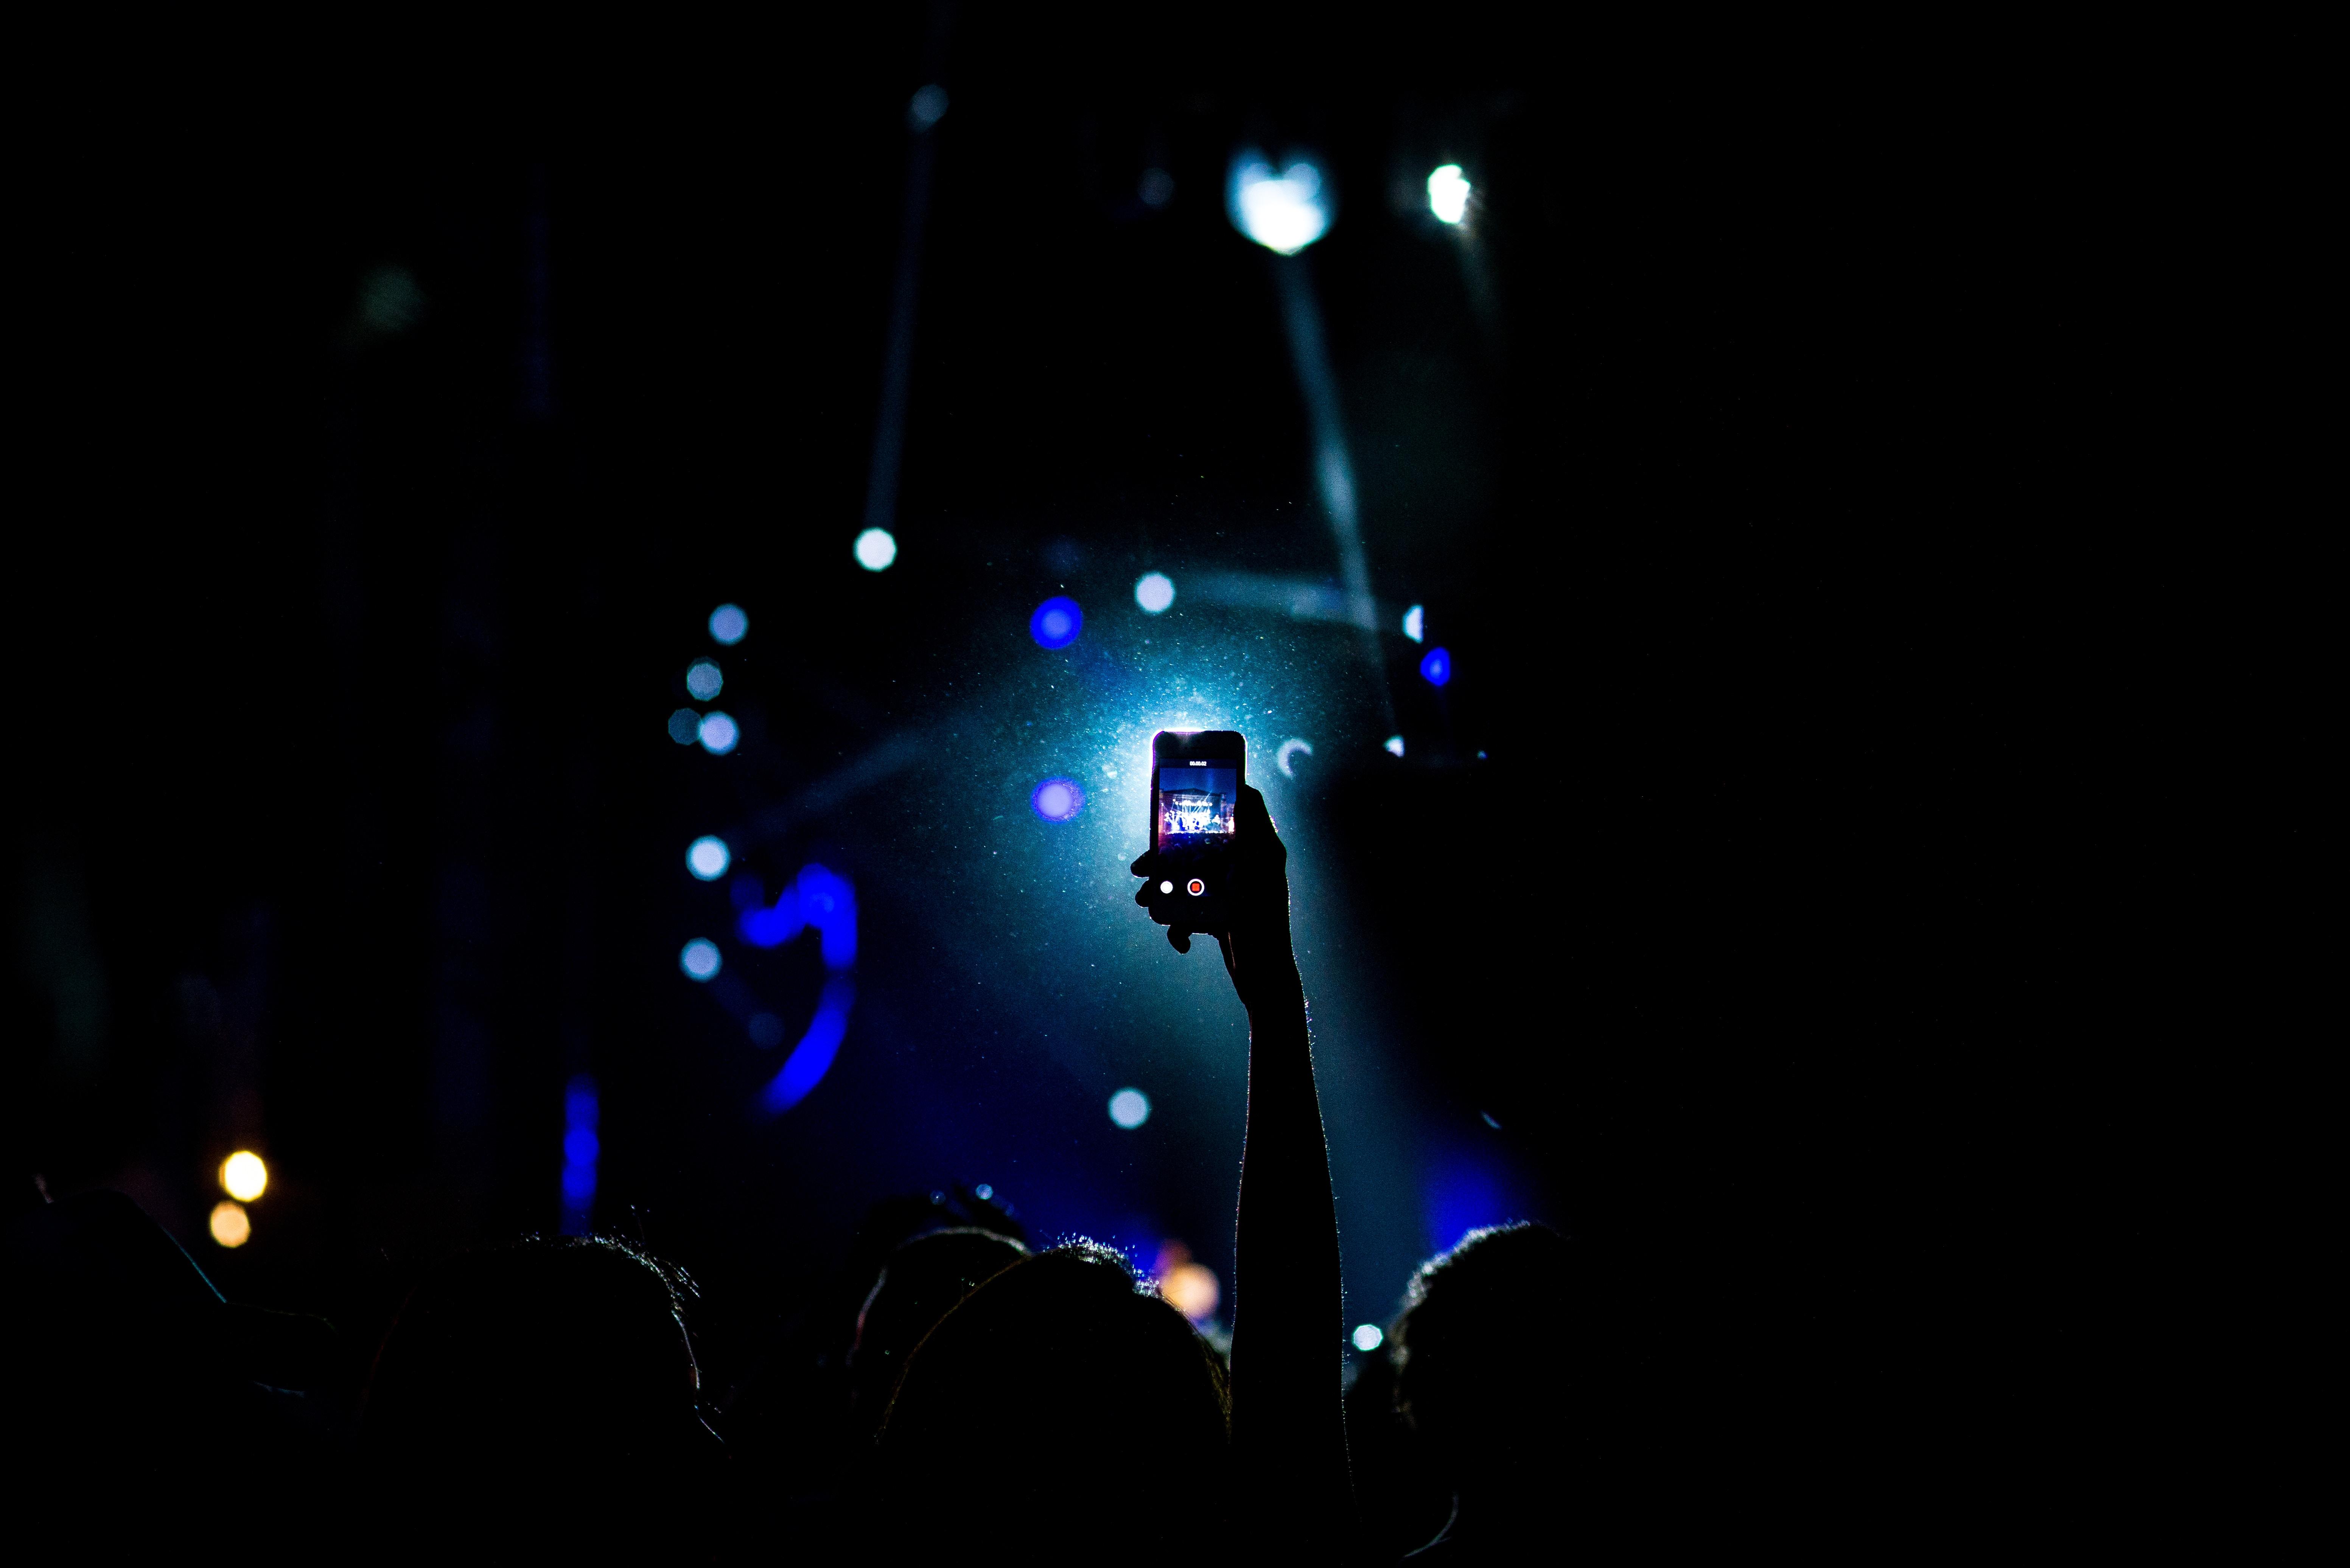 Top 10 Video Monetization Platforms - InPlayer Paywall